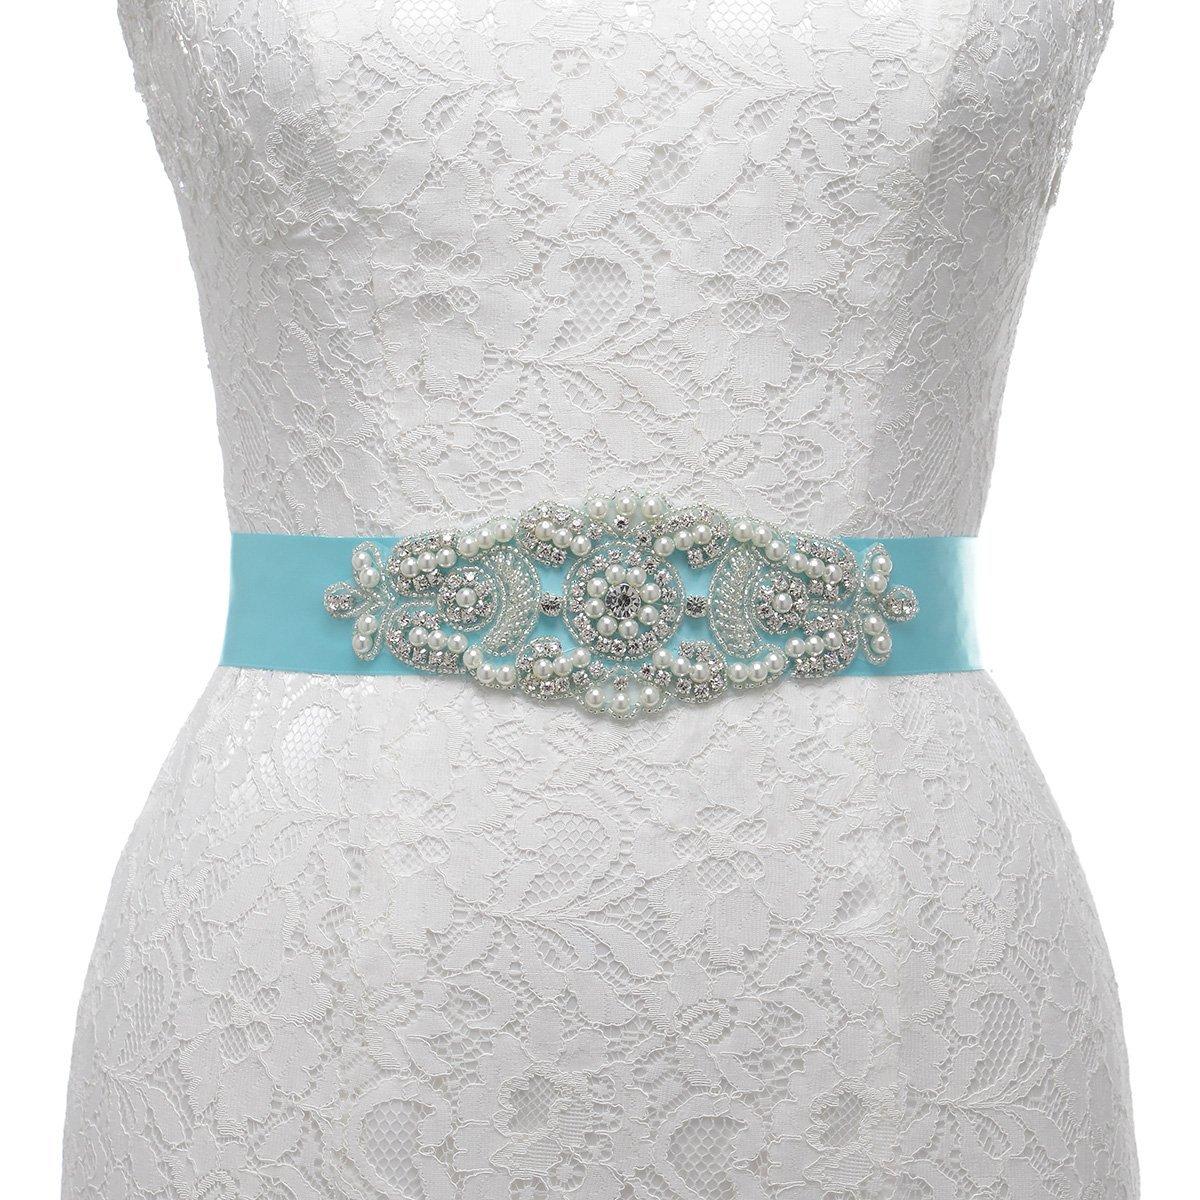 Topwedding ACCESSORY レディース B01FVWL1OK (I)Mint blue